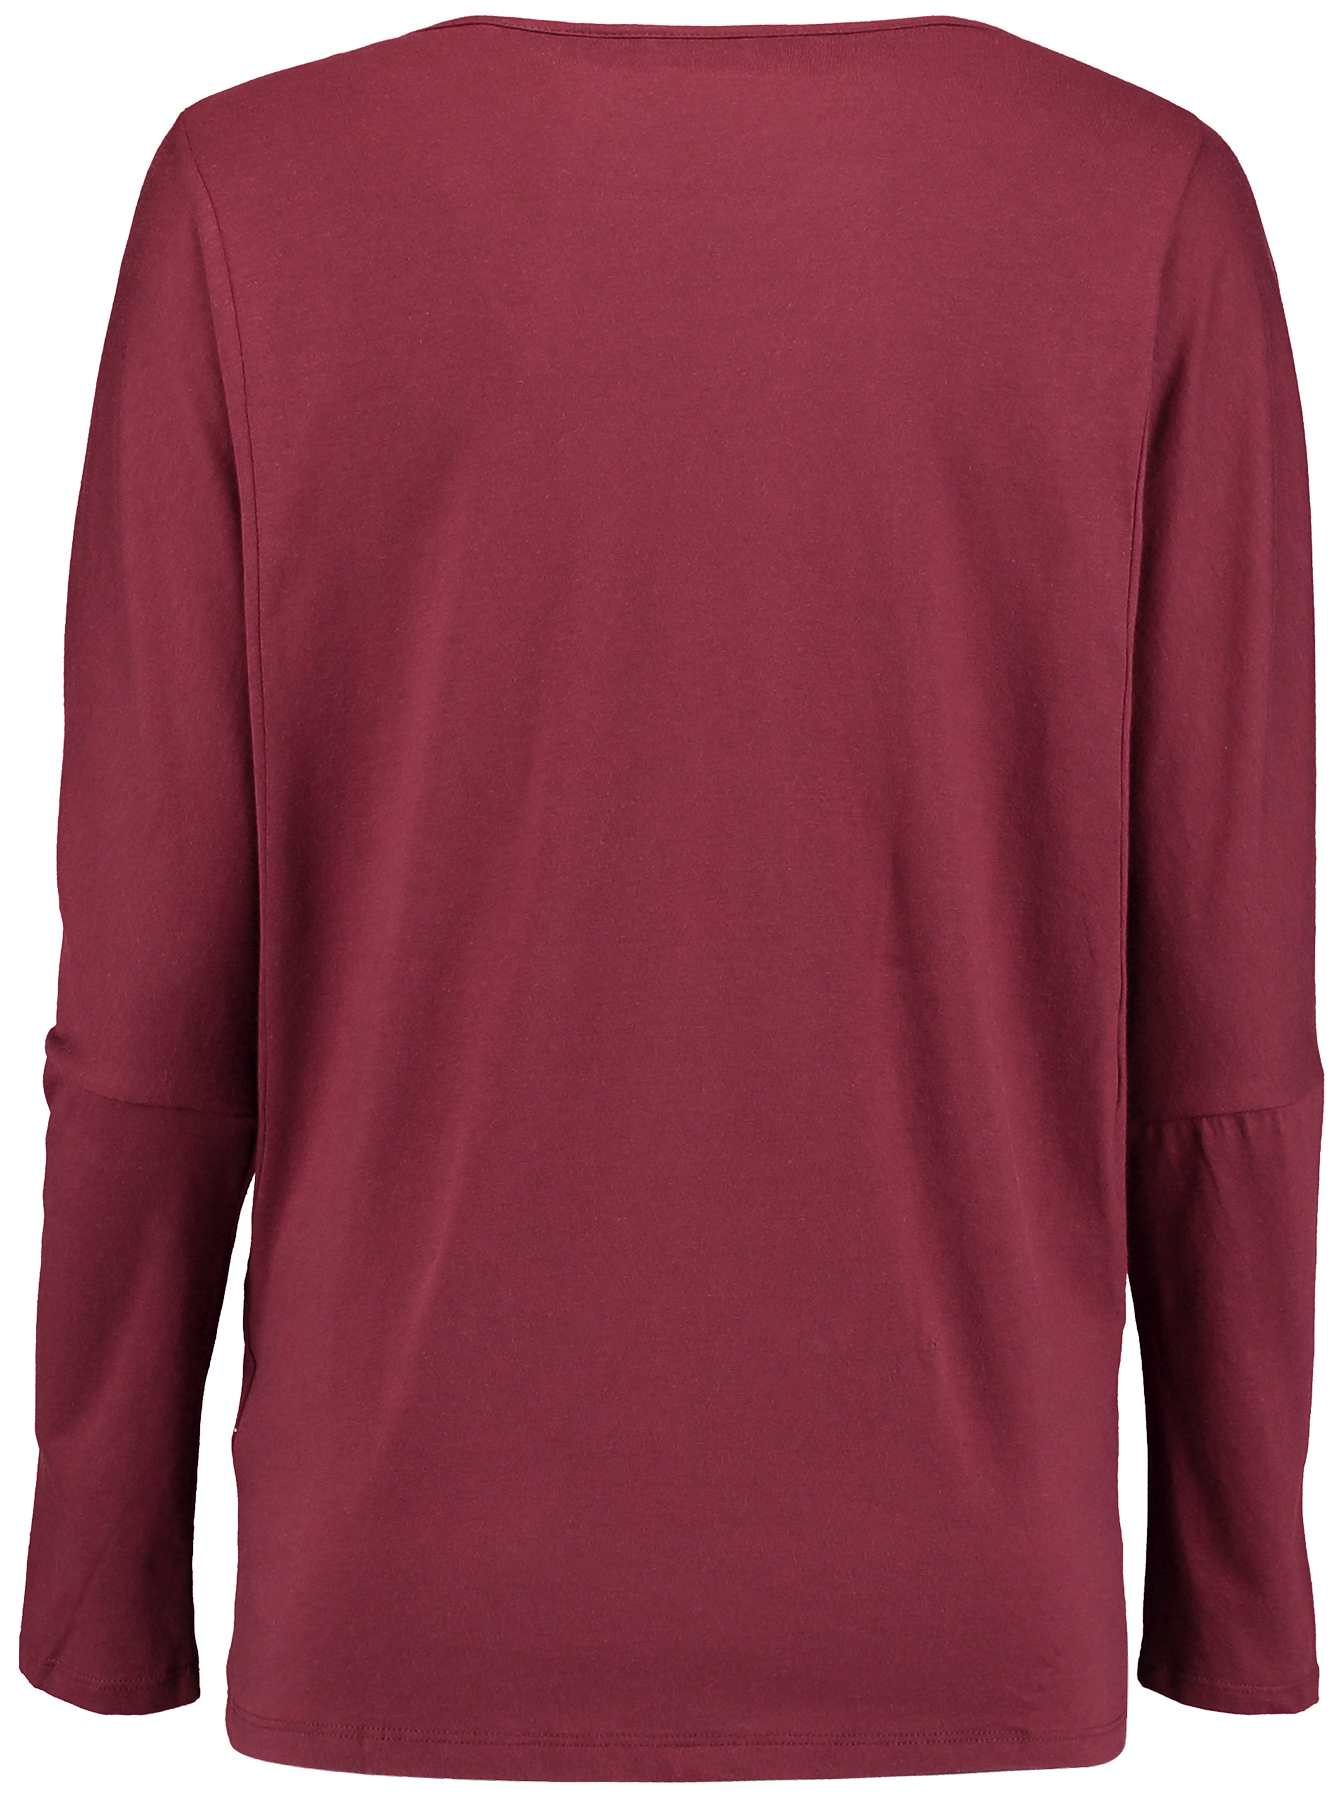 O Neill LW SQUAW VALLEY T-SHIRT. Dámské tričko s dlouhým rukávem. Dámské  tričko s dlouhým rukávem 28836ac3d3